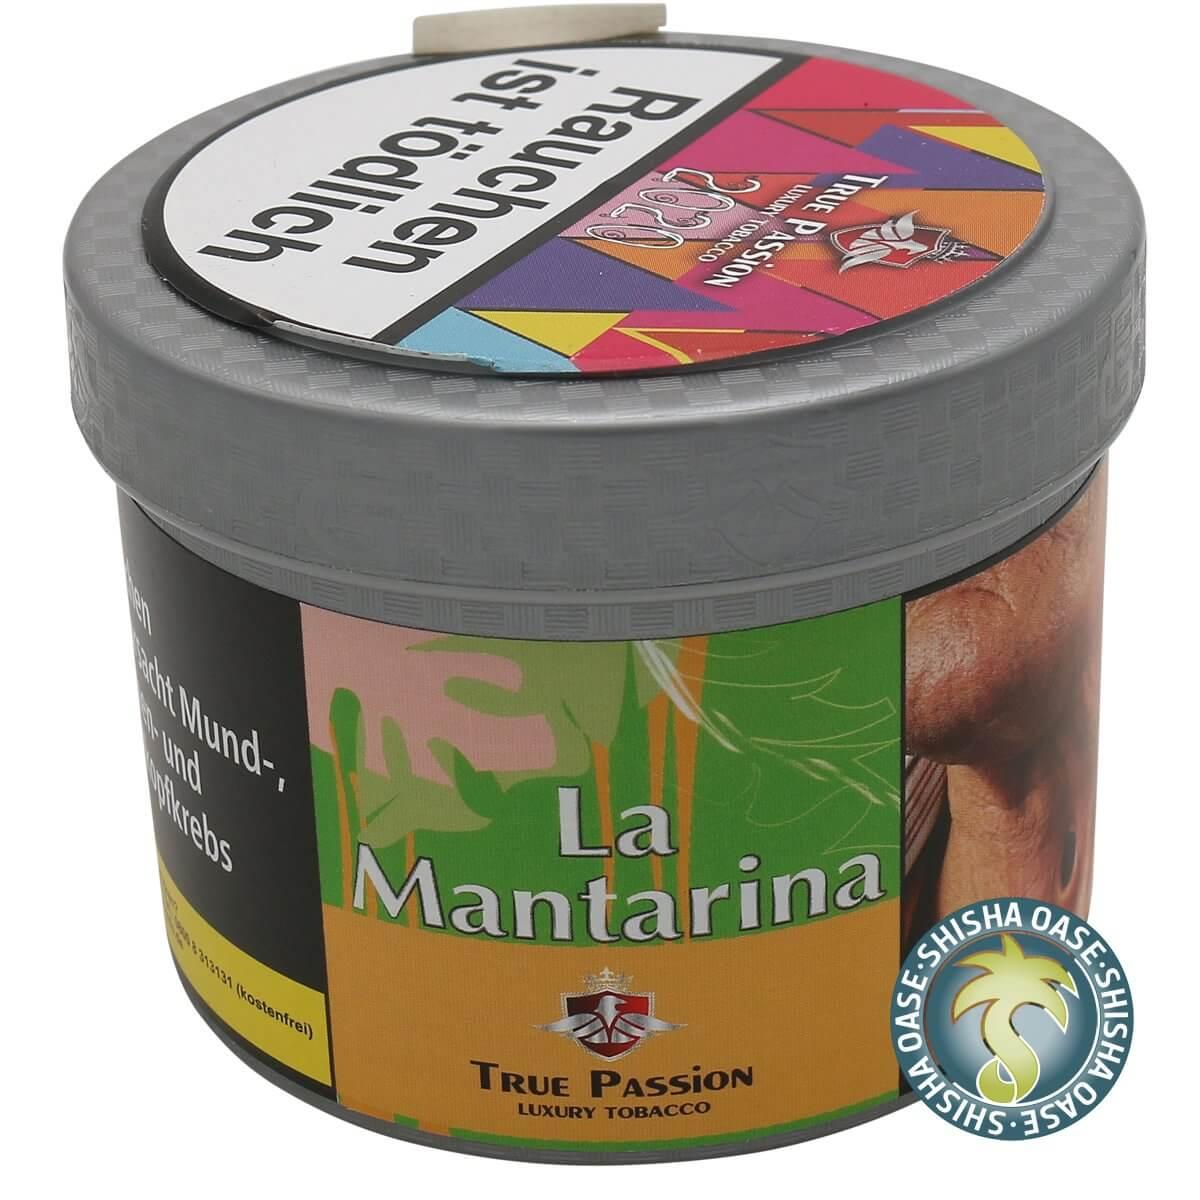 True Passion Tabak 200g Dose | Lá Mantarina